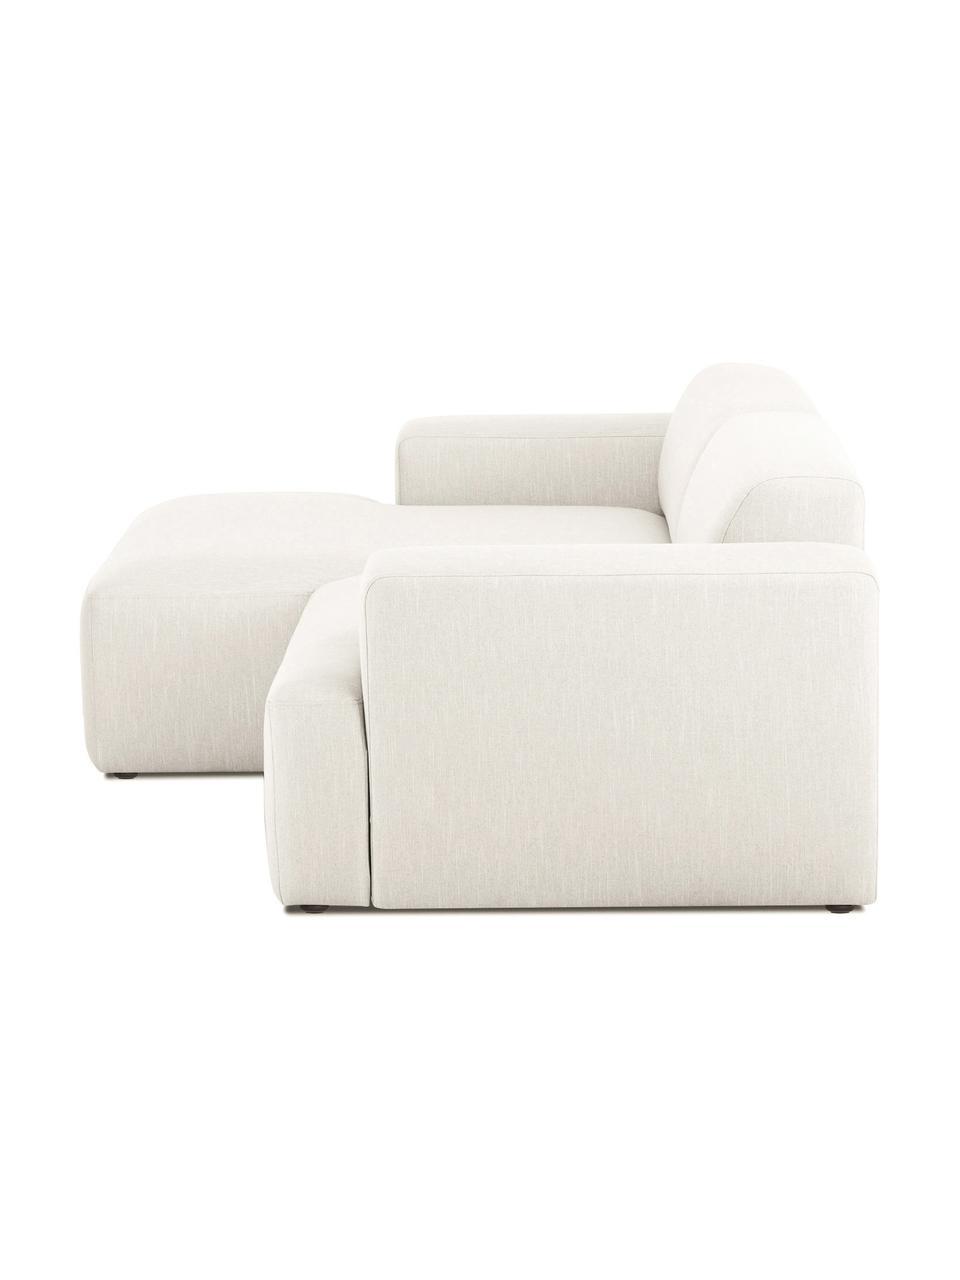 Ecksofa Melva (3-Sitzer) in Beige, Bezug: 100% Polyester Der hochwe, Gestell: Massives Kiefernholz, FSC, Füße: Kunststoff, Webstoff Beige, B 239 x T 143 cm